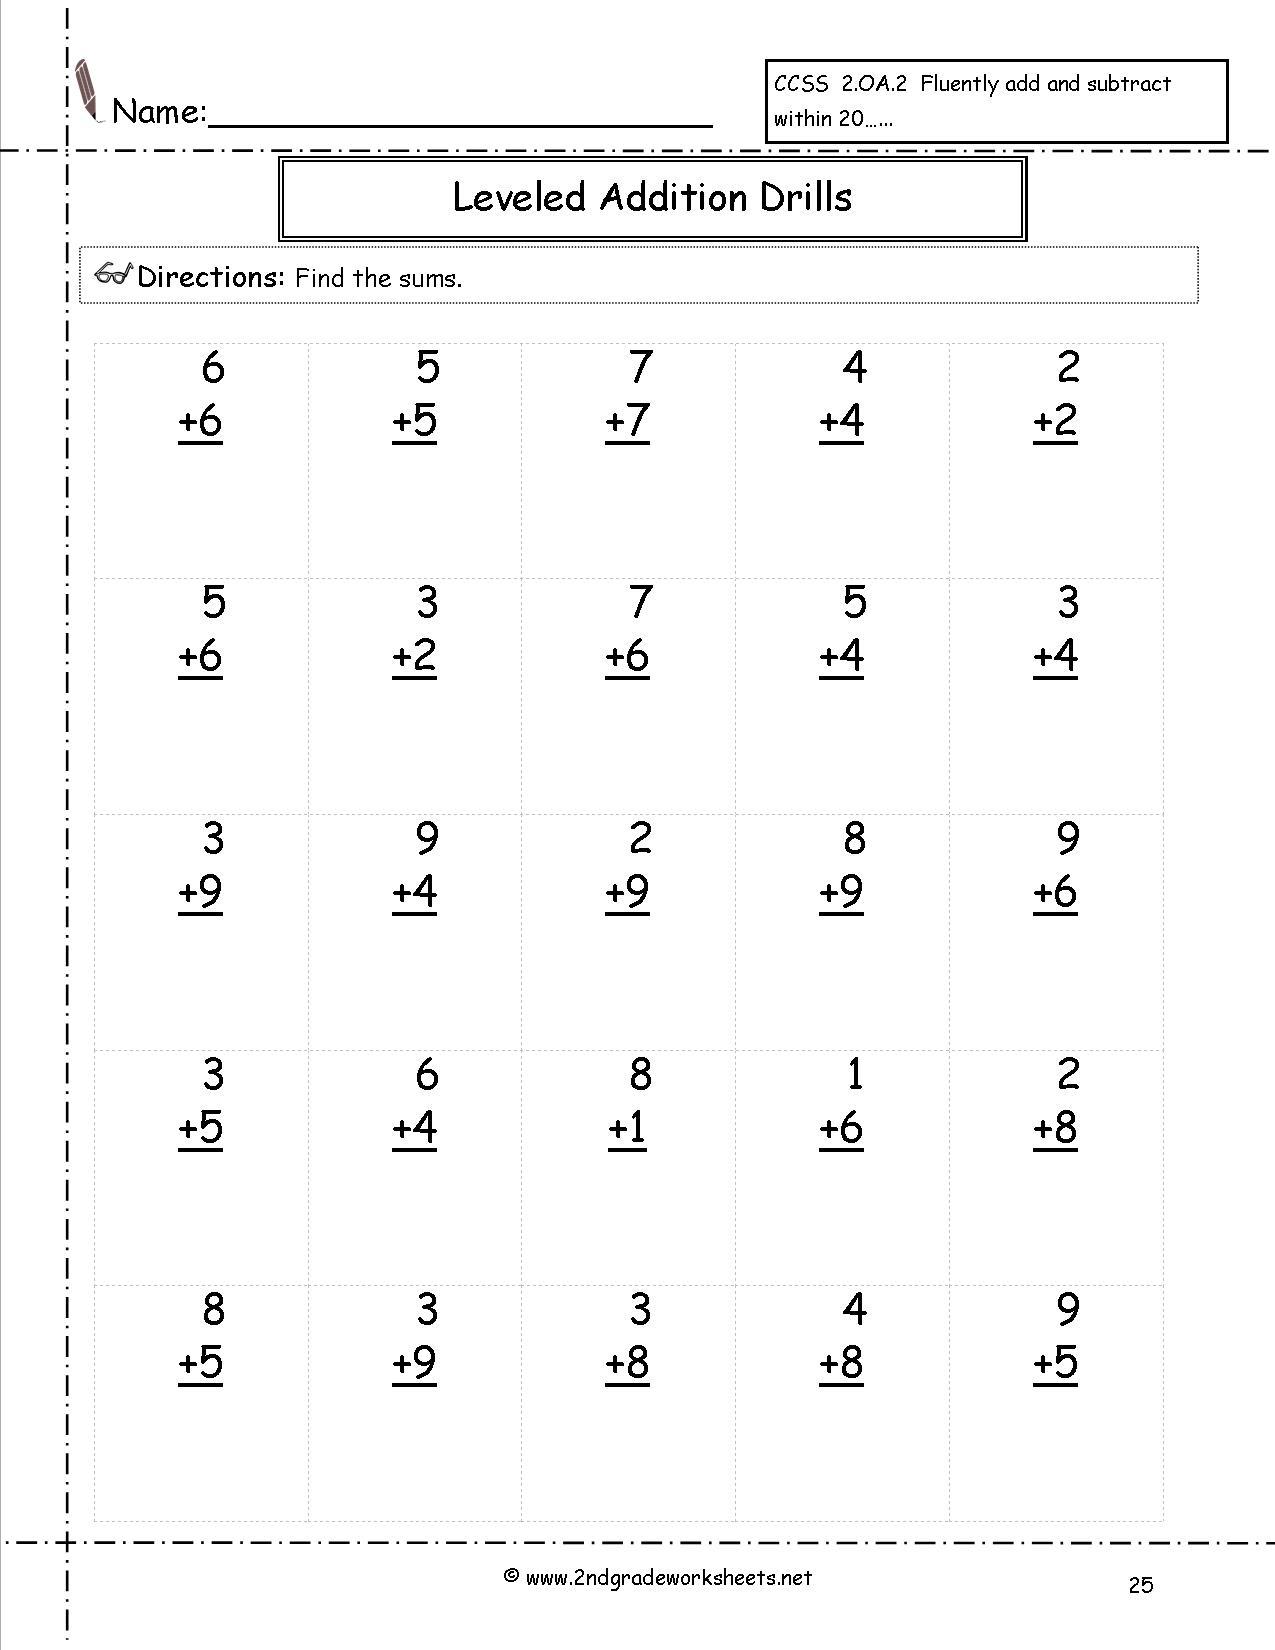 Free Math Worksheets And Printouts   Free Printable Second Grade Math Worksheets